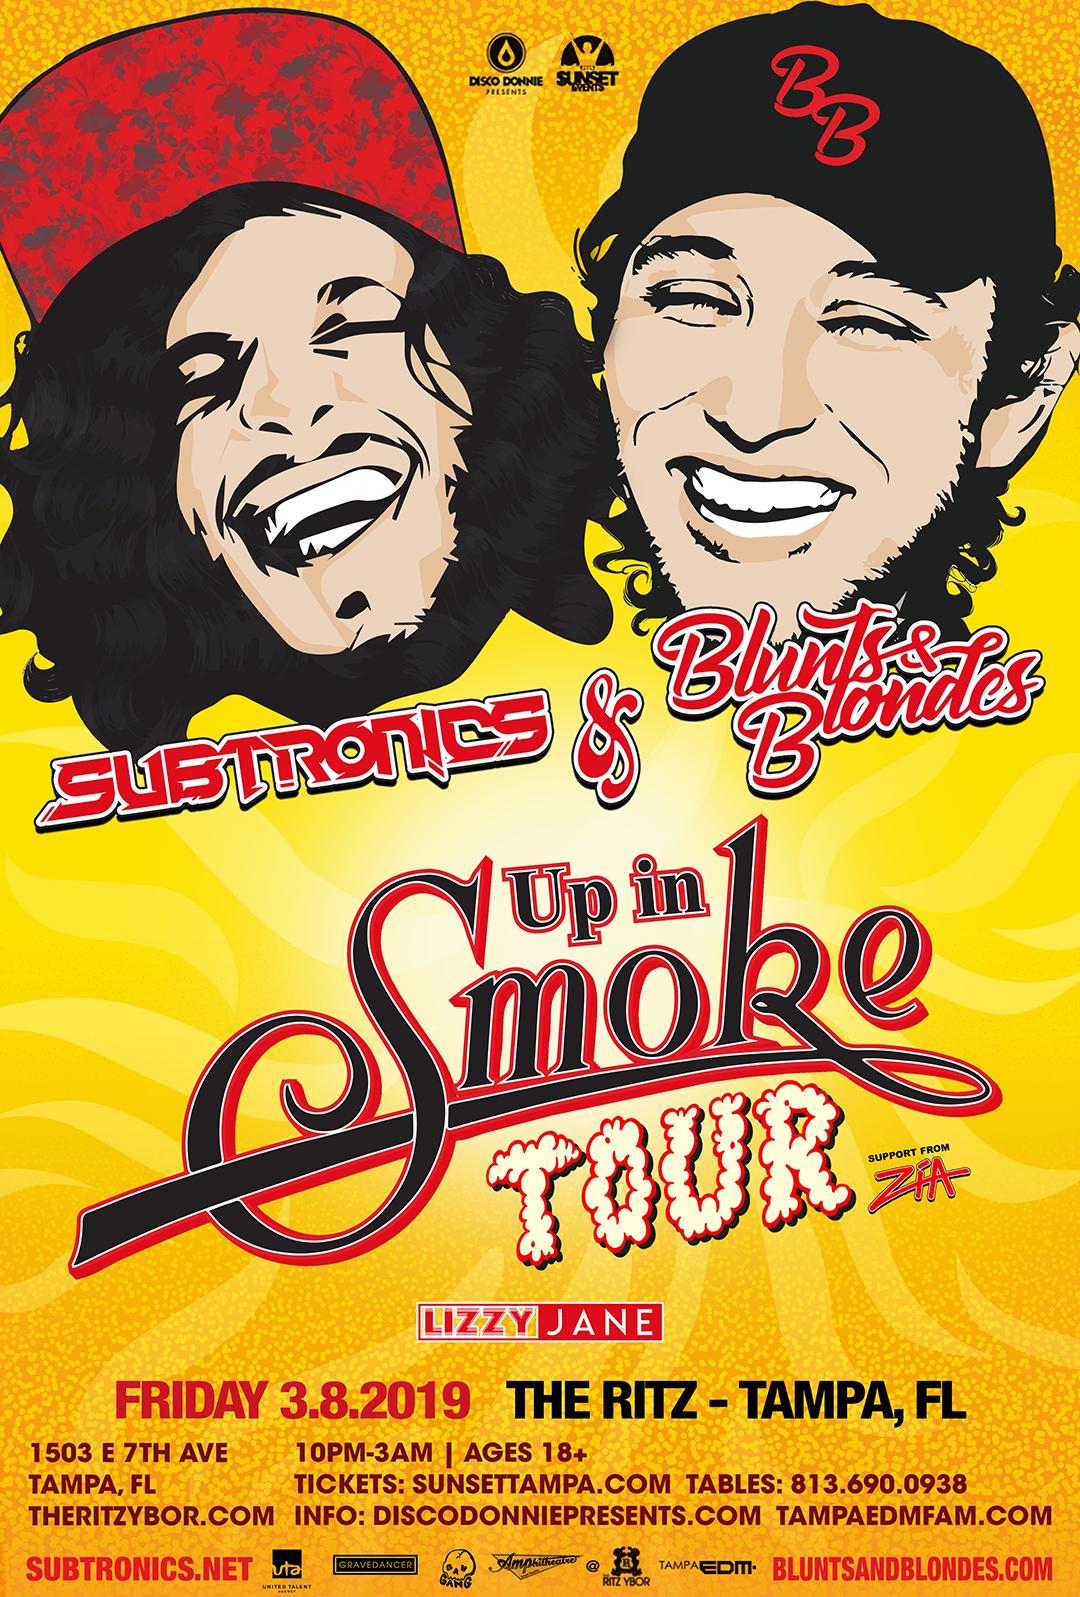 Subtronics + Blunts & Blondes – Up In Smoke Tour – #POUND Fridays at The RITZ Ybor – 3/8/2019